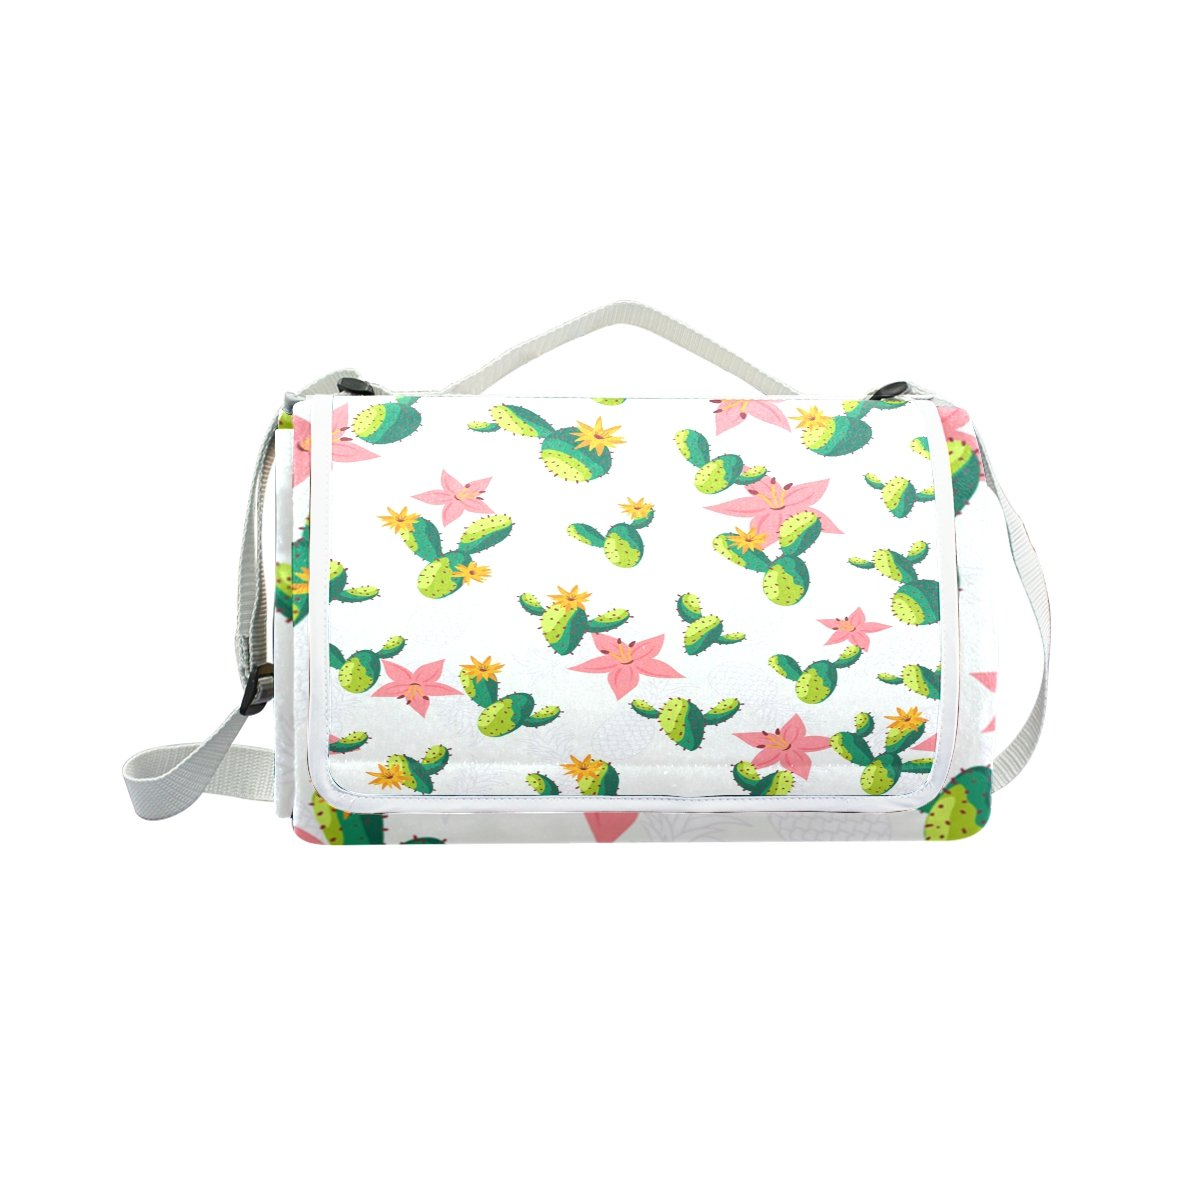 My Little Nest Outdoor Camping Picnic Beach Blanket Mat Cactus Lightweight Portable Folding Travel Pad 57'' x 59''